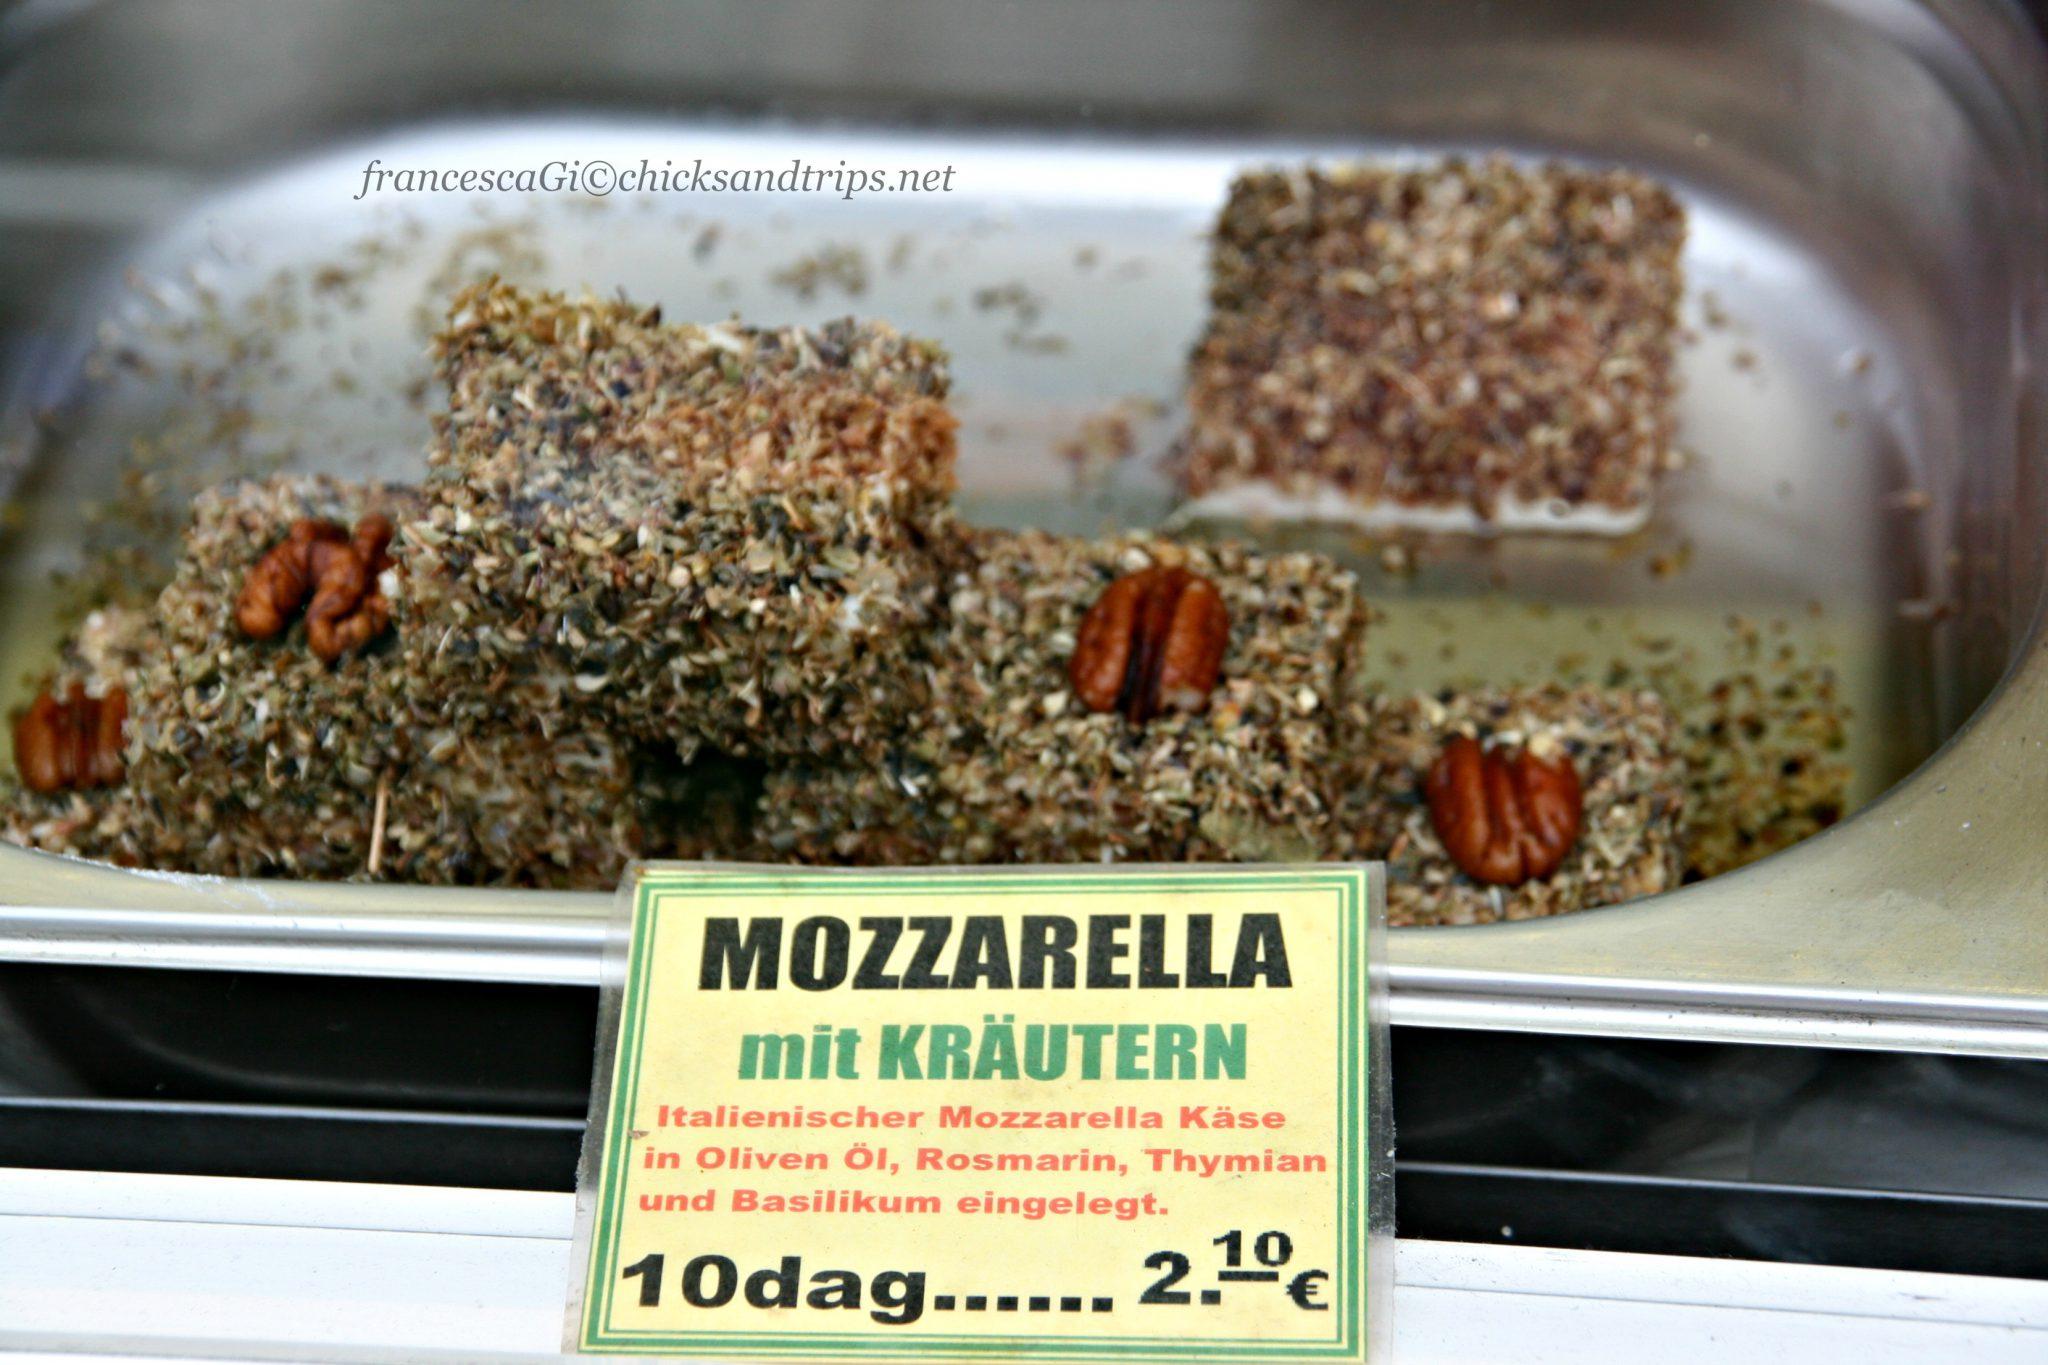 Mozzarella???